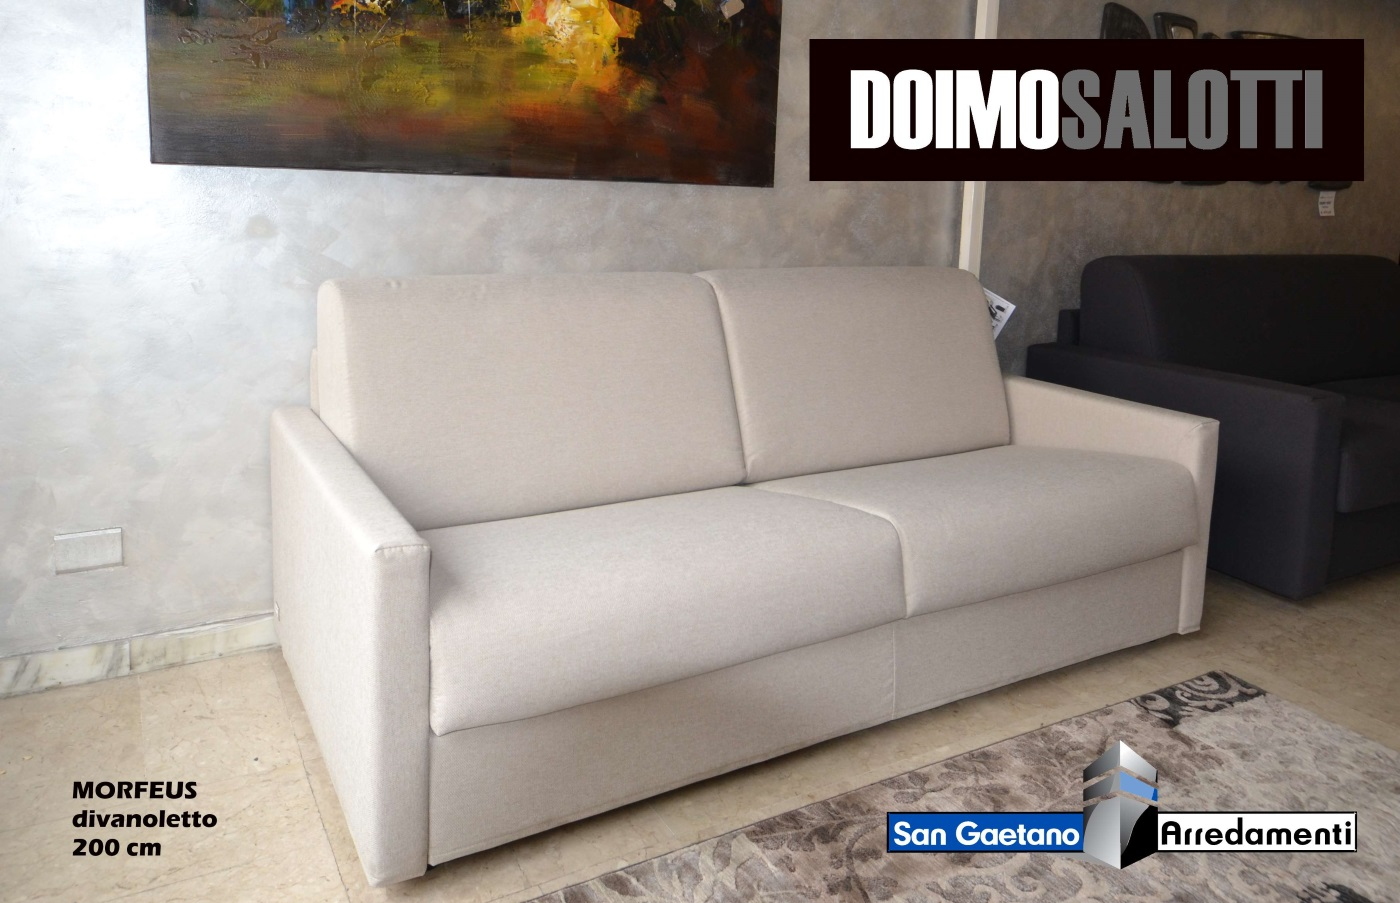 https://www.sangaetanoarredamenti.com/wp-content/uploads/2017/03/Z-morpheus-letto-doimo-salotti-200x90.jpg